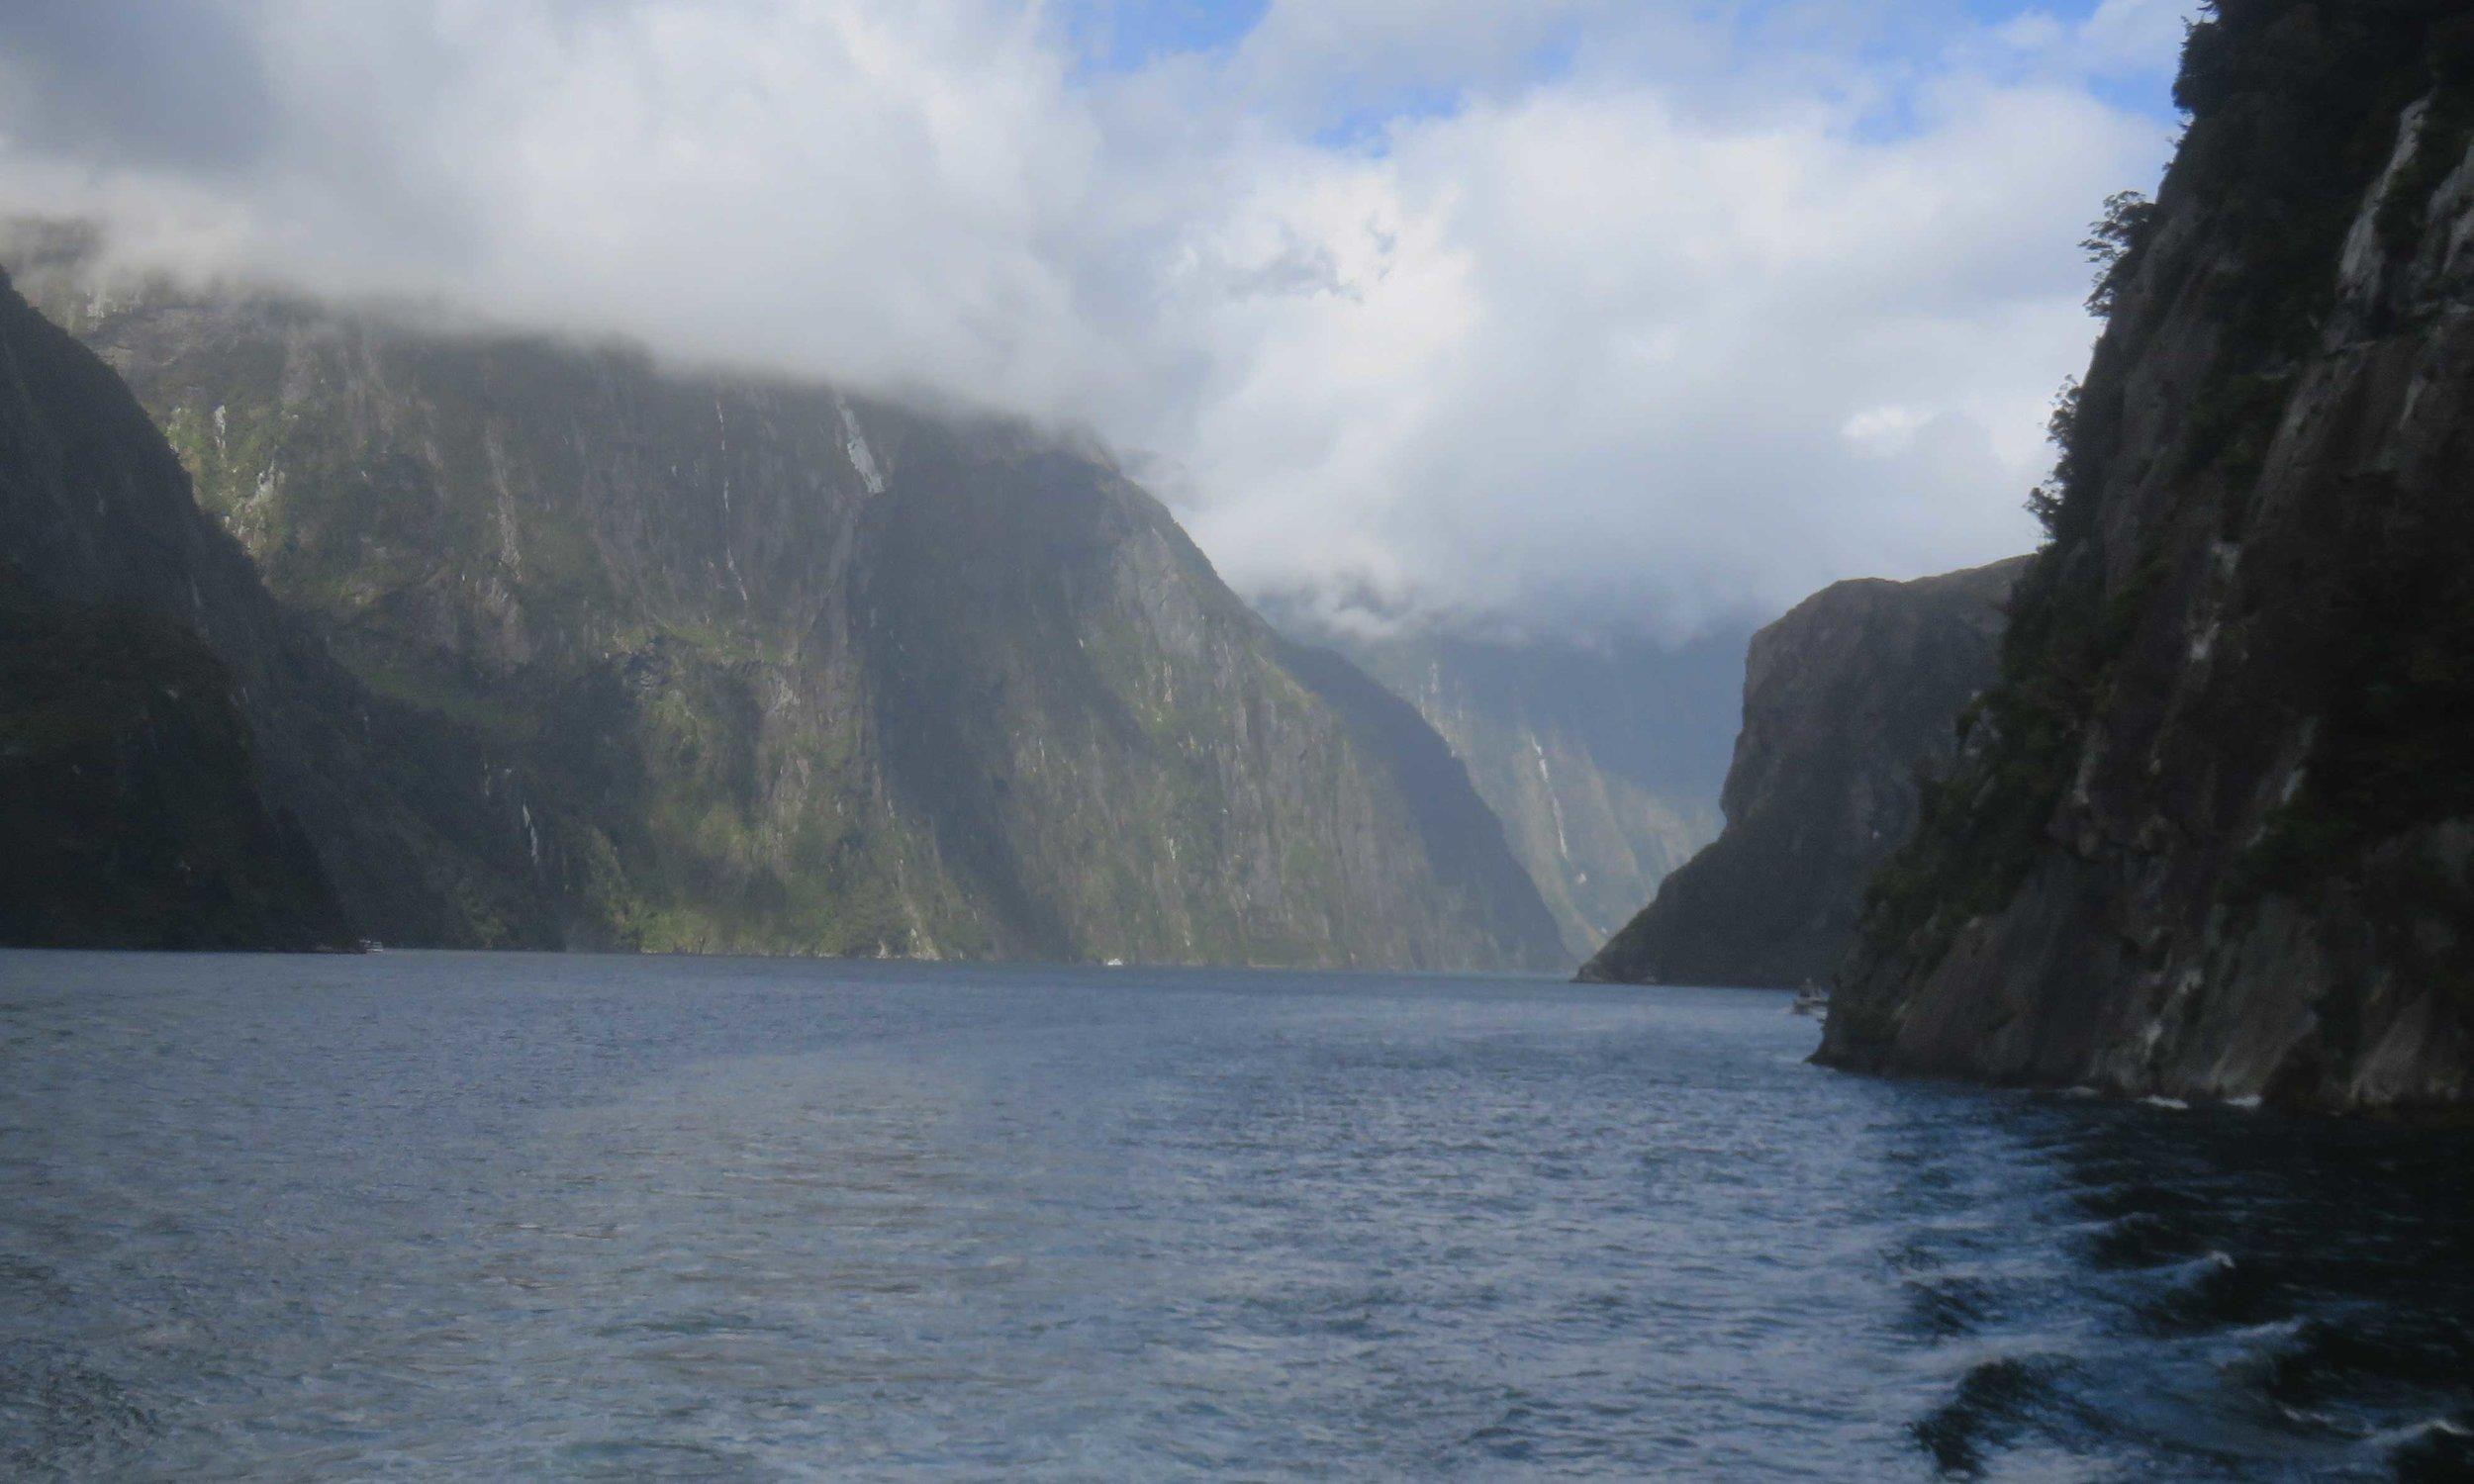 Milfords Sound